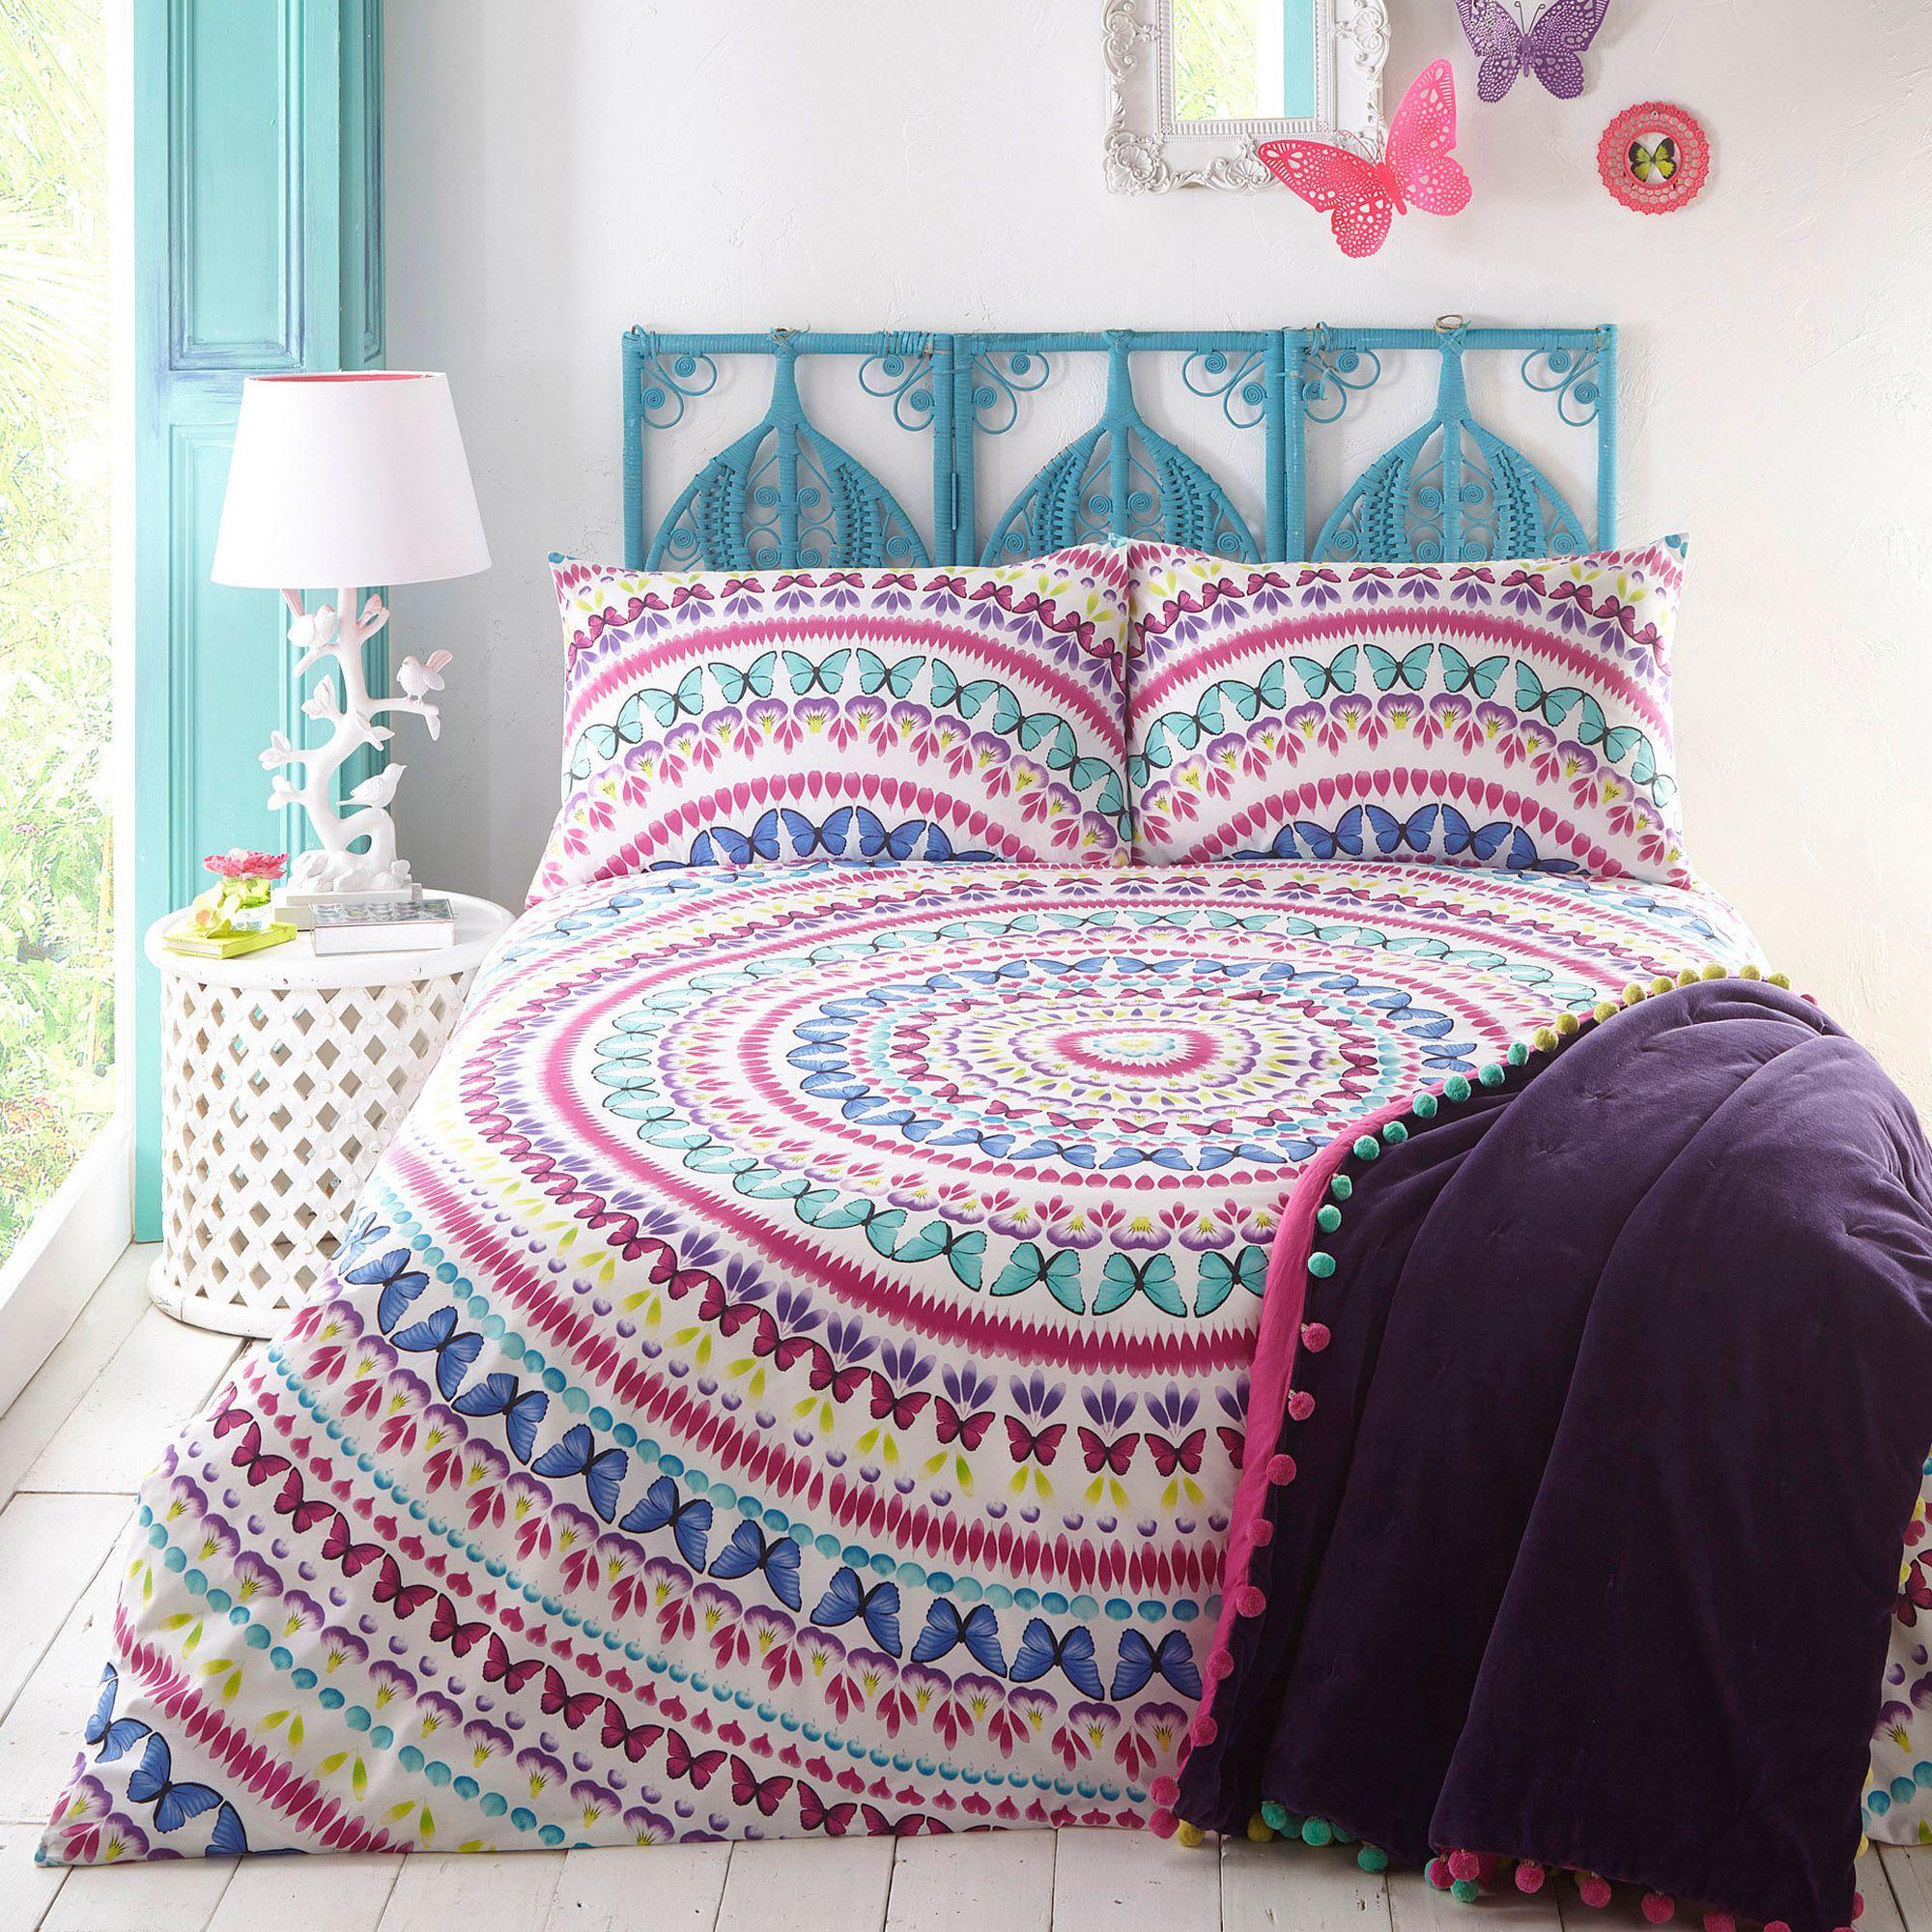 ebay Debenhams   Bed linens luxury, Bed, Bedding set